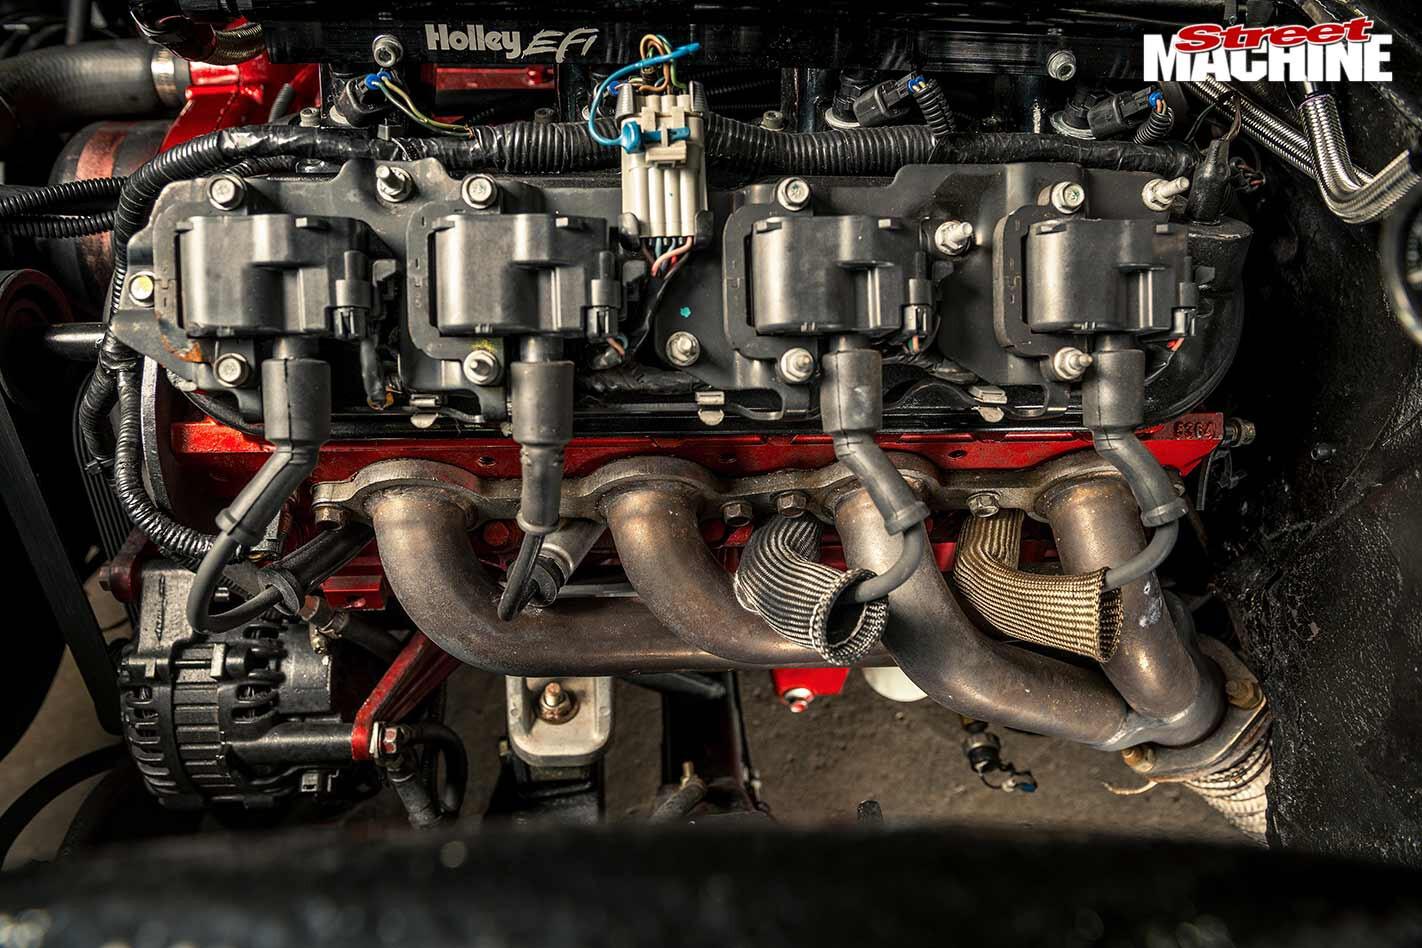 LS-powered Rodeo engine